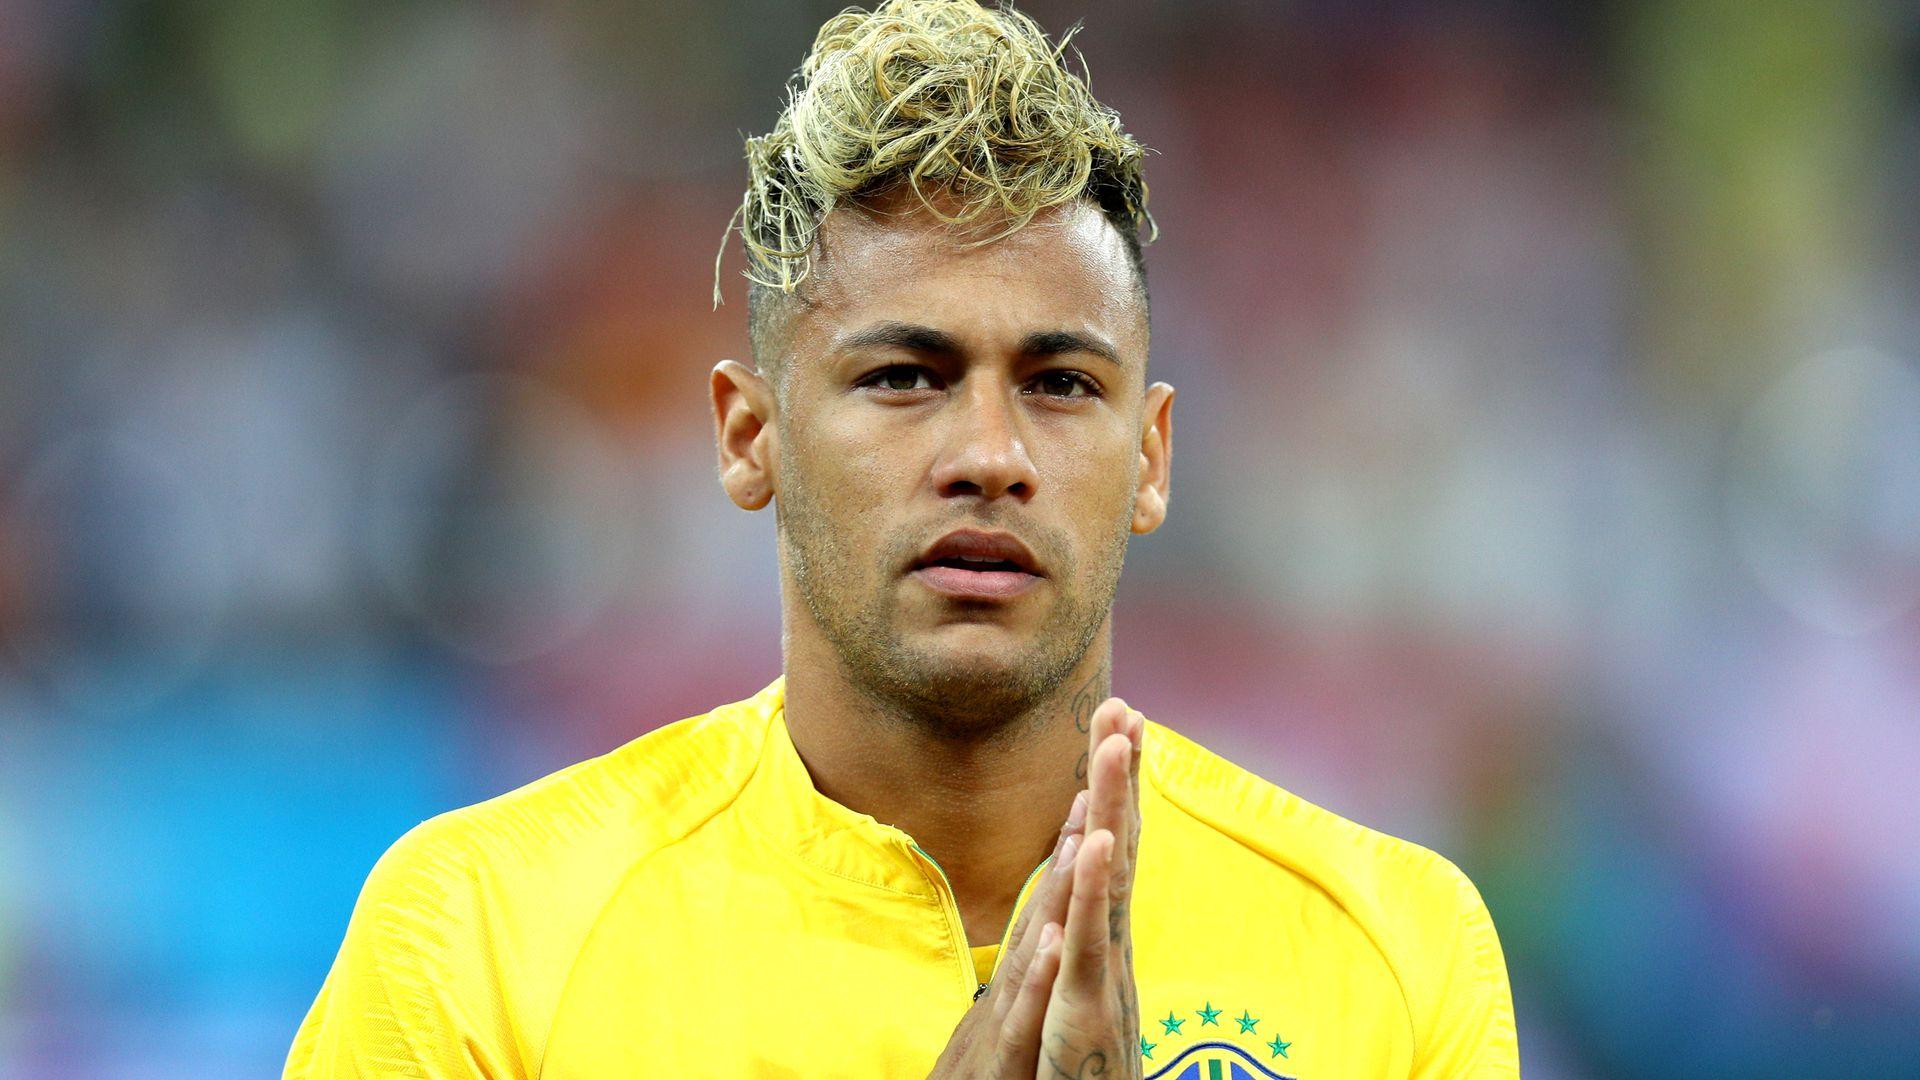 Wie GroГџ Ist Neymar